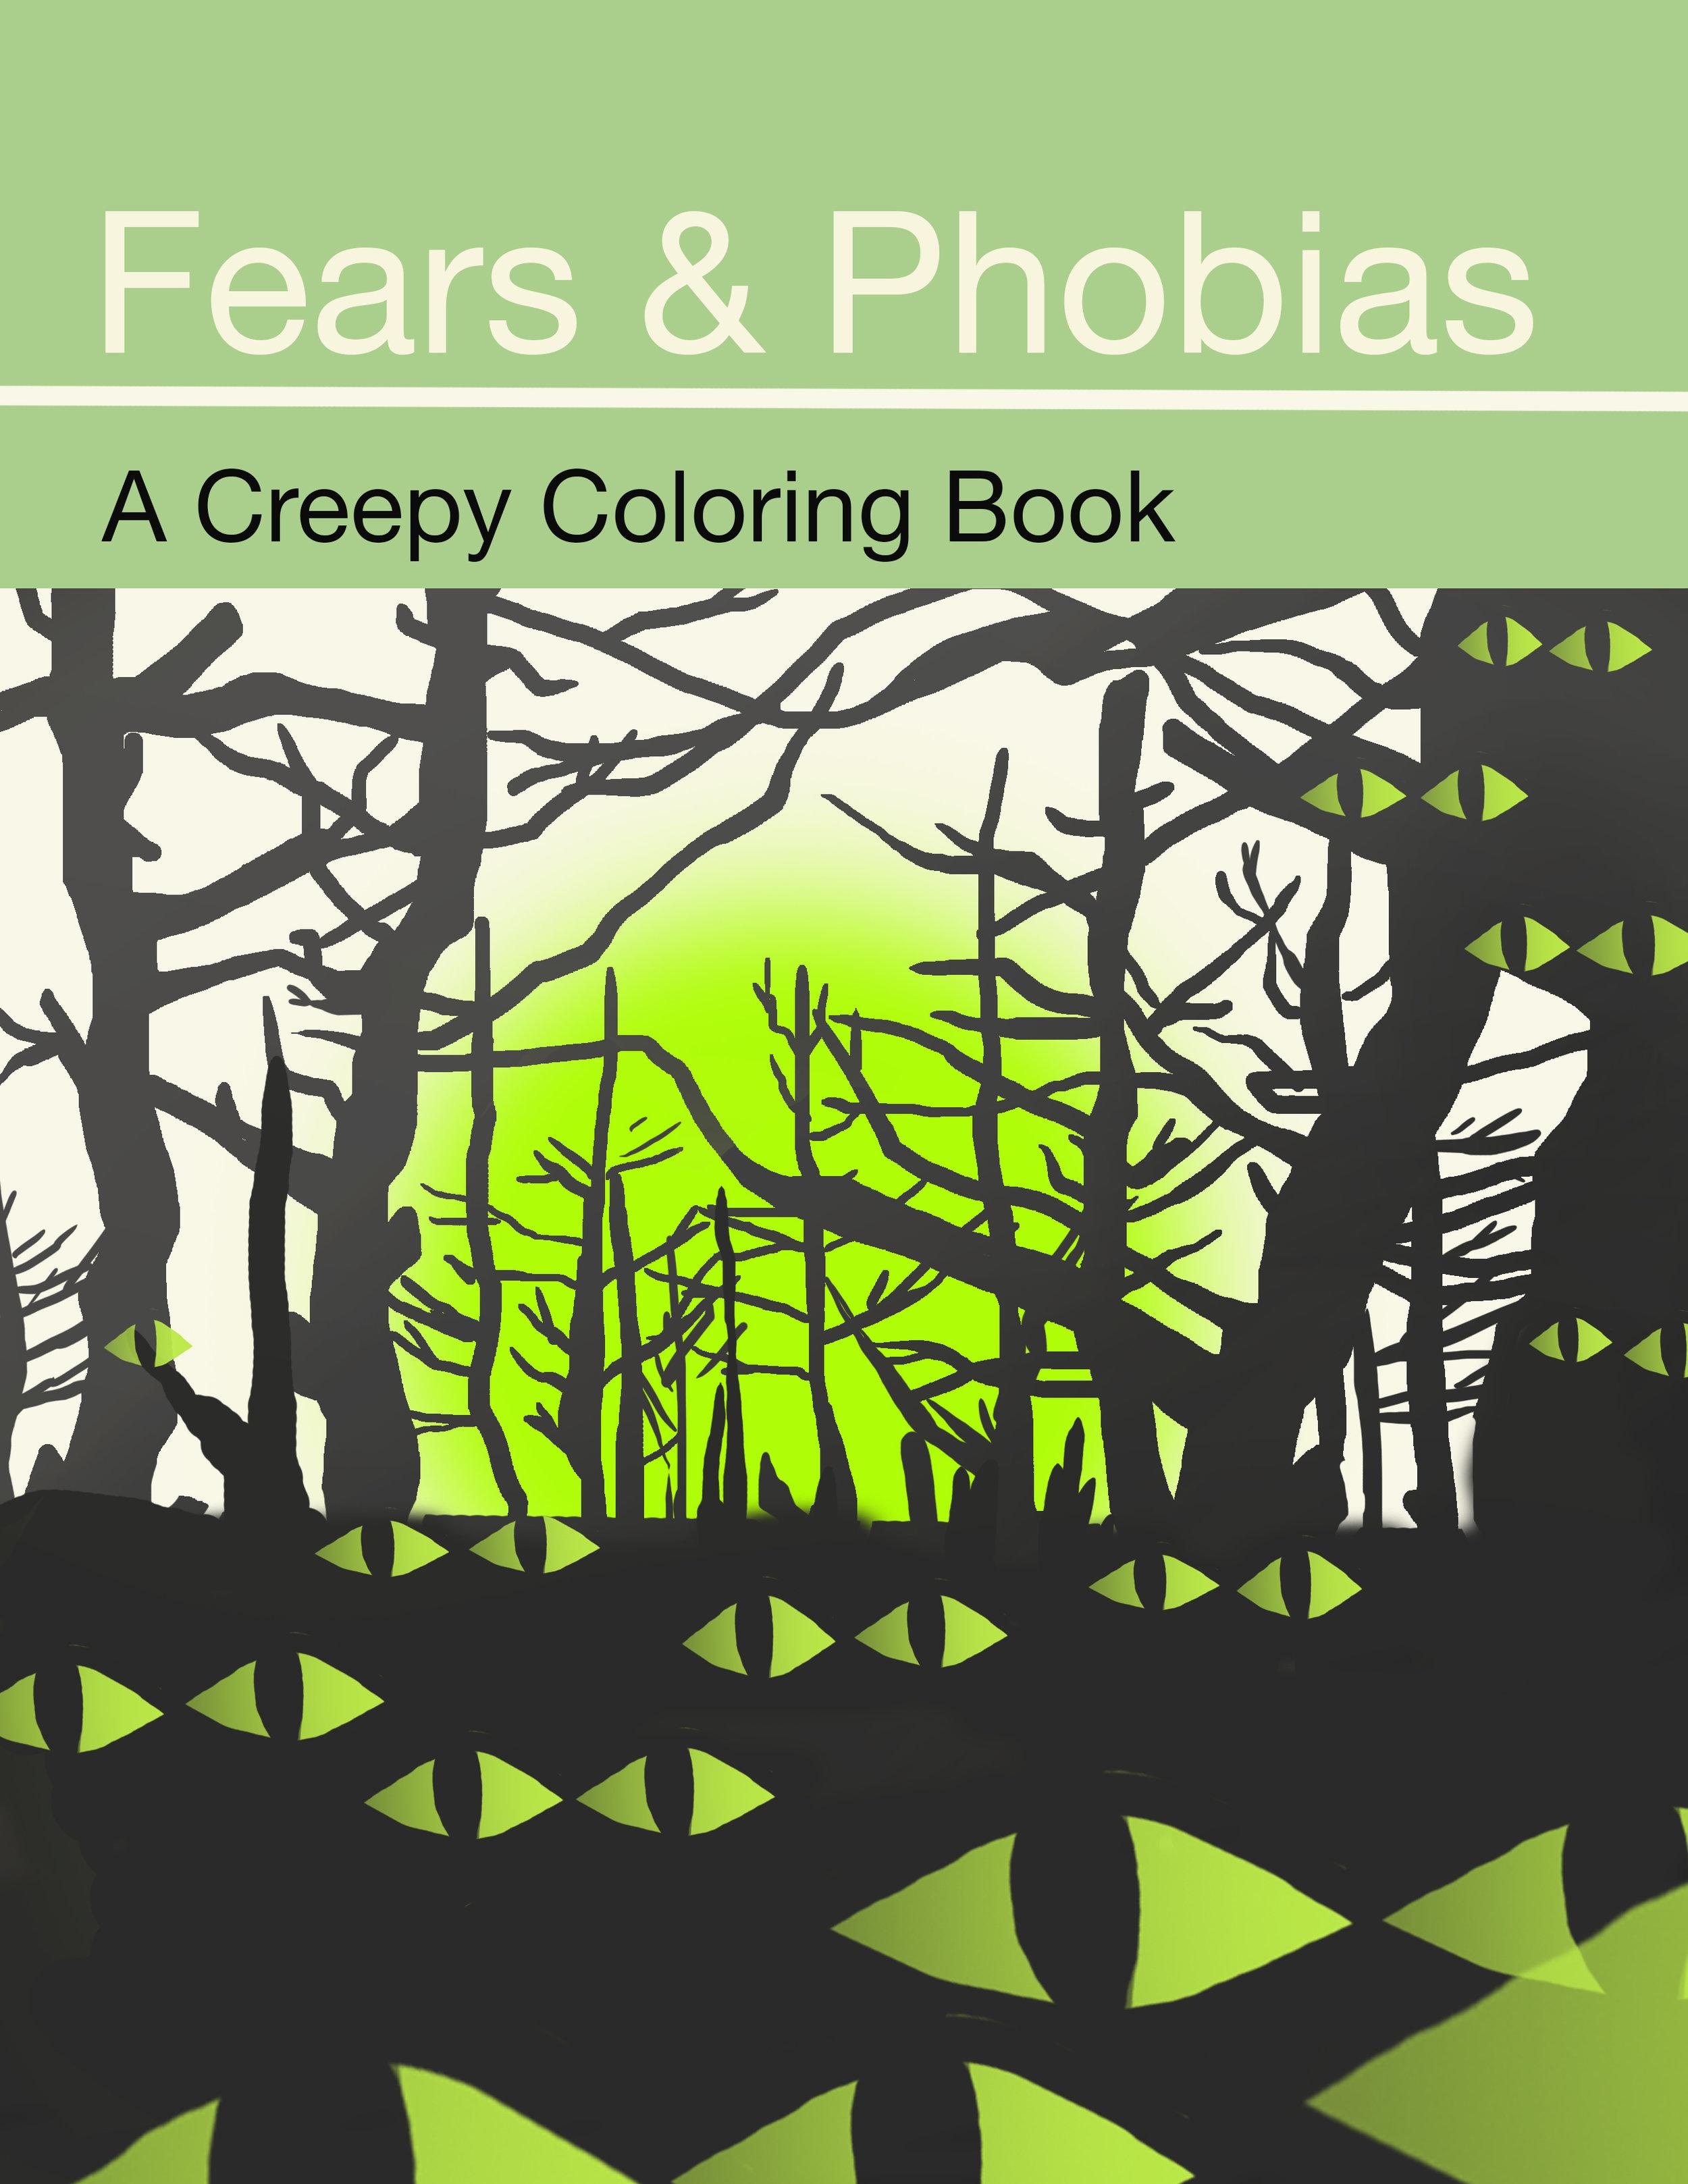 fears and phobias.jpg